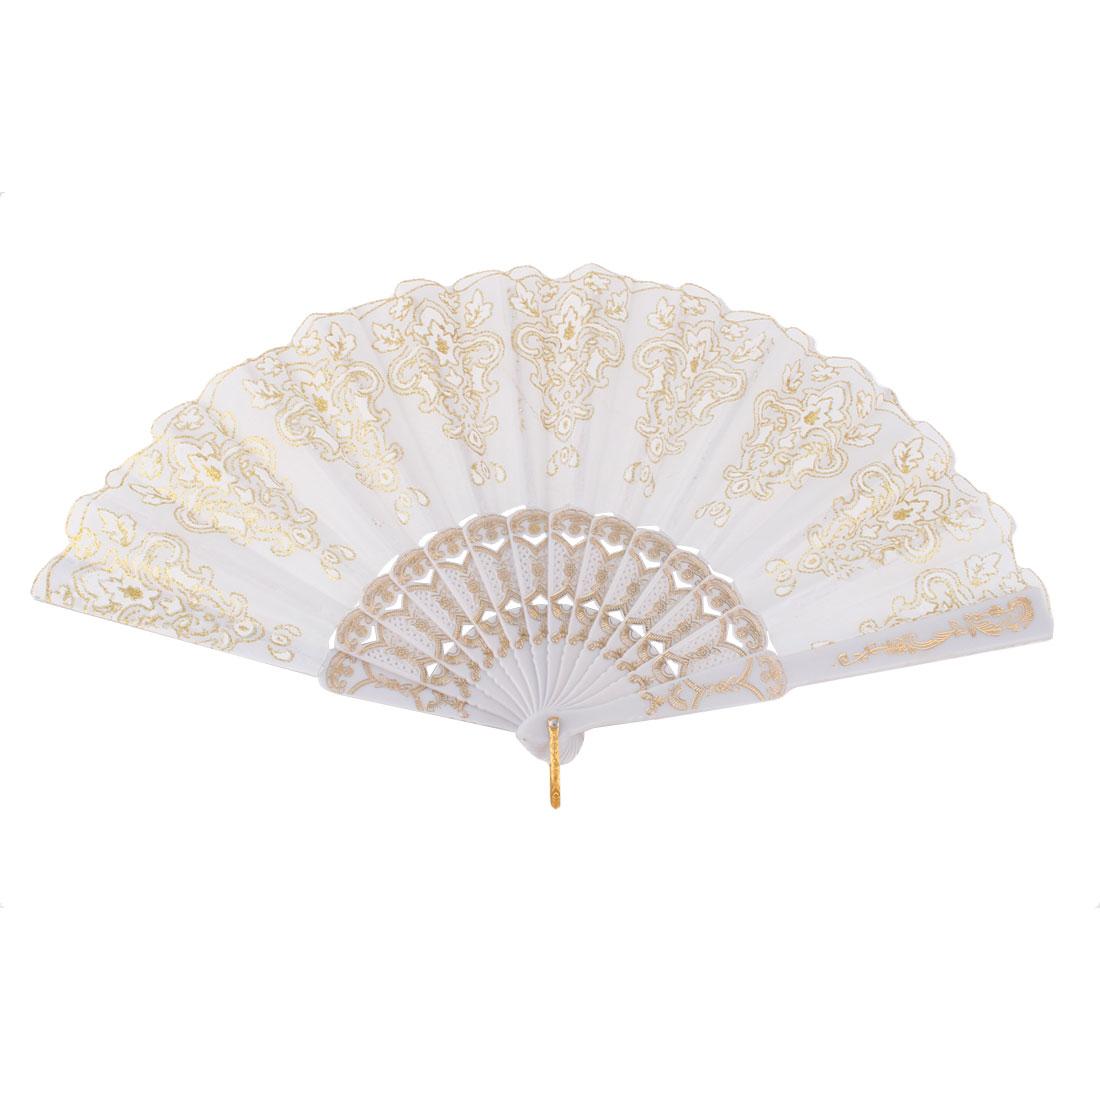 Dancing Chinese Style Flower Pattern Folding Fan Gold Tone White